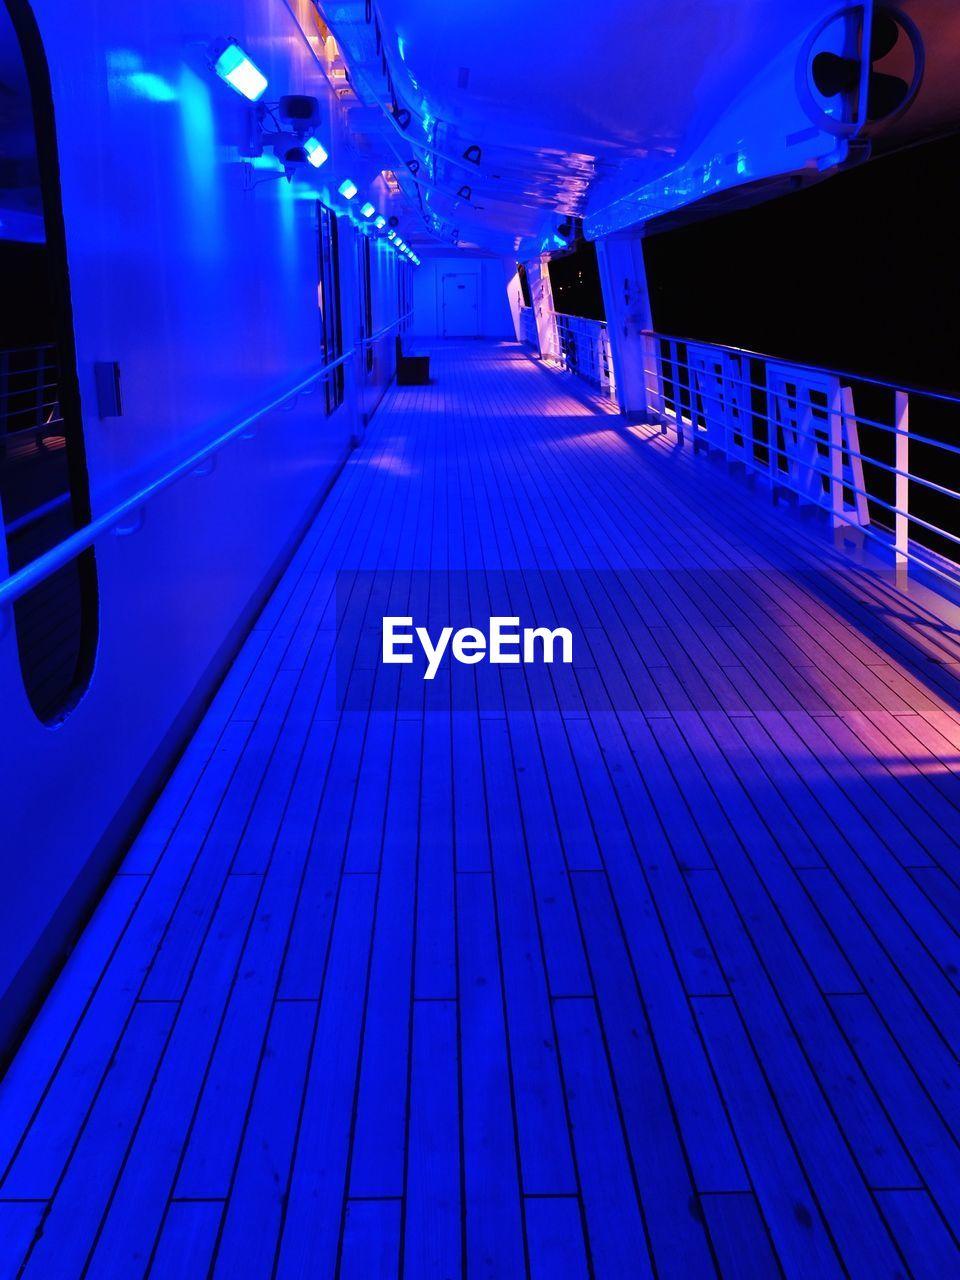 Illuminated Deck On Cruise Ship At Night